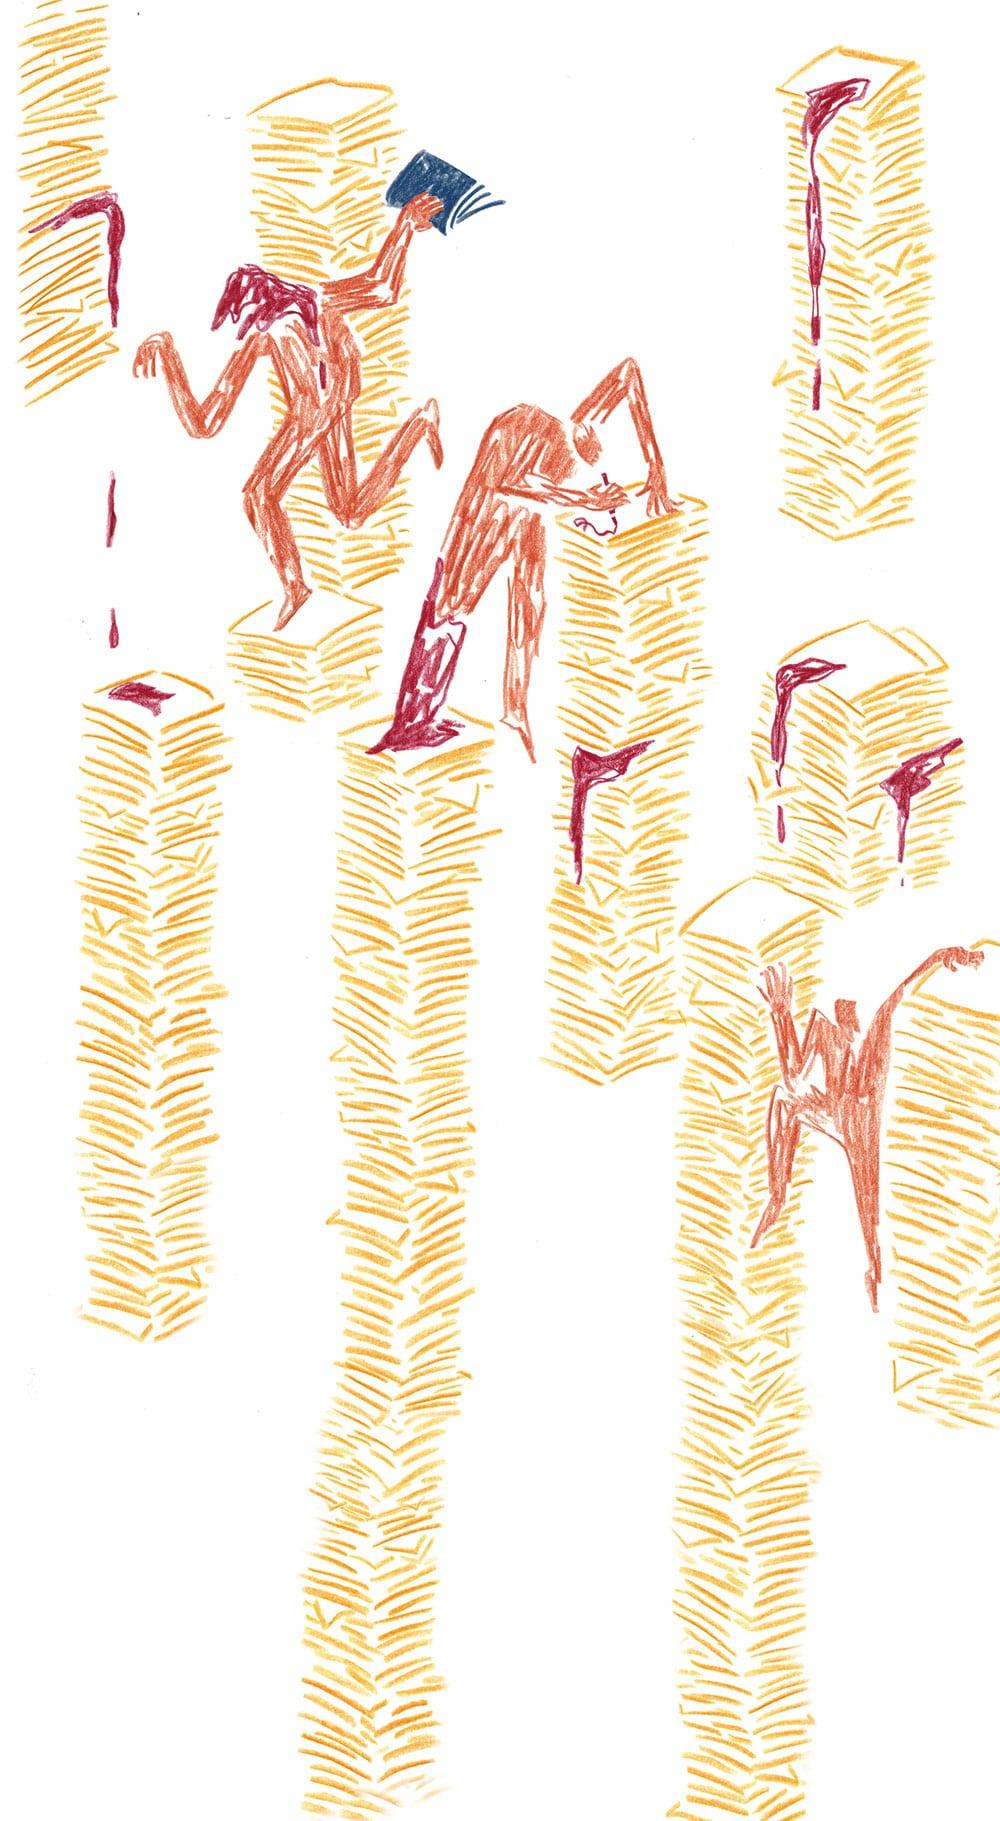 Illustration Beyza Yilmaz zu Walter Benjamin »Einbahnstraße«